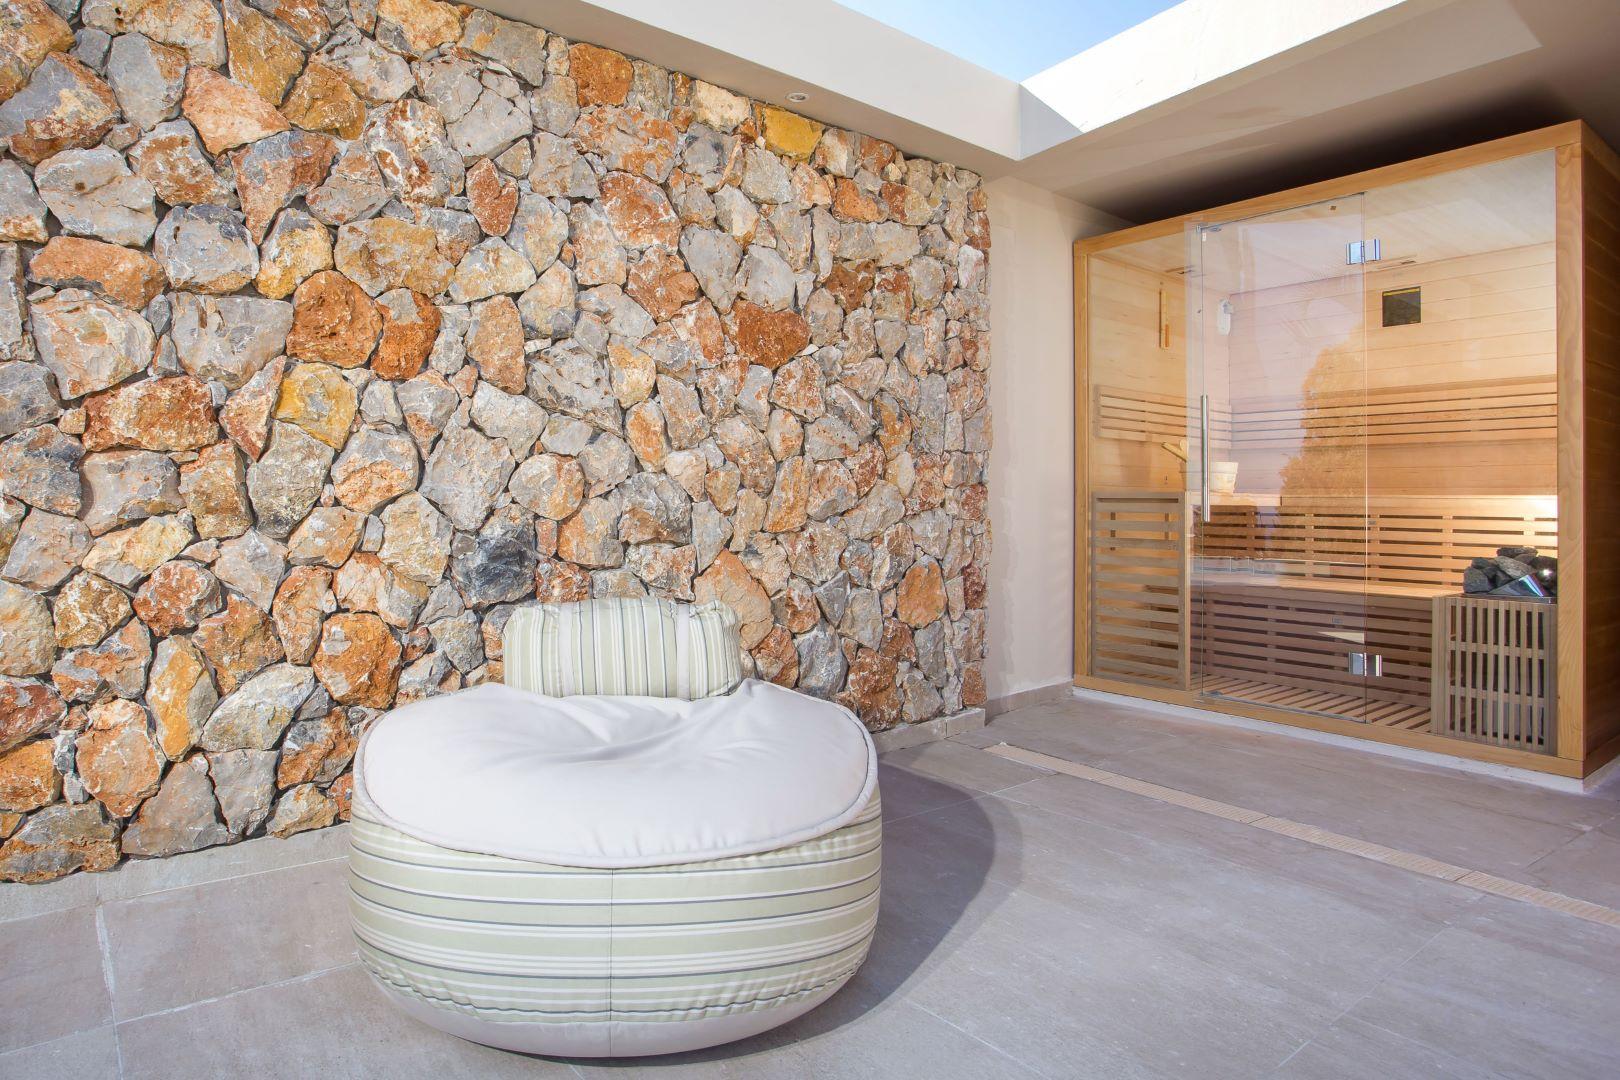 Venezia-Luxury-Living-villas-at-Faliraki-Rhodes-Greece-11